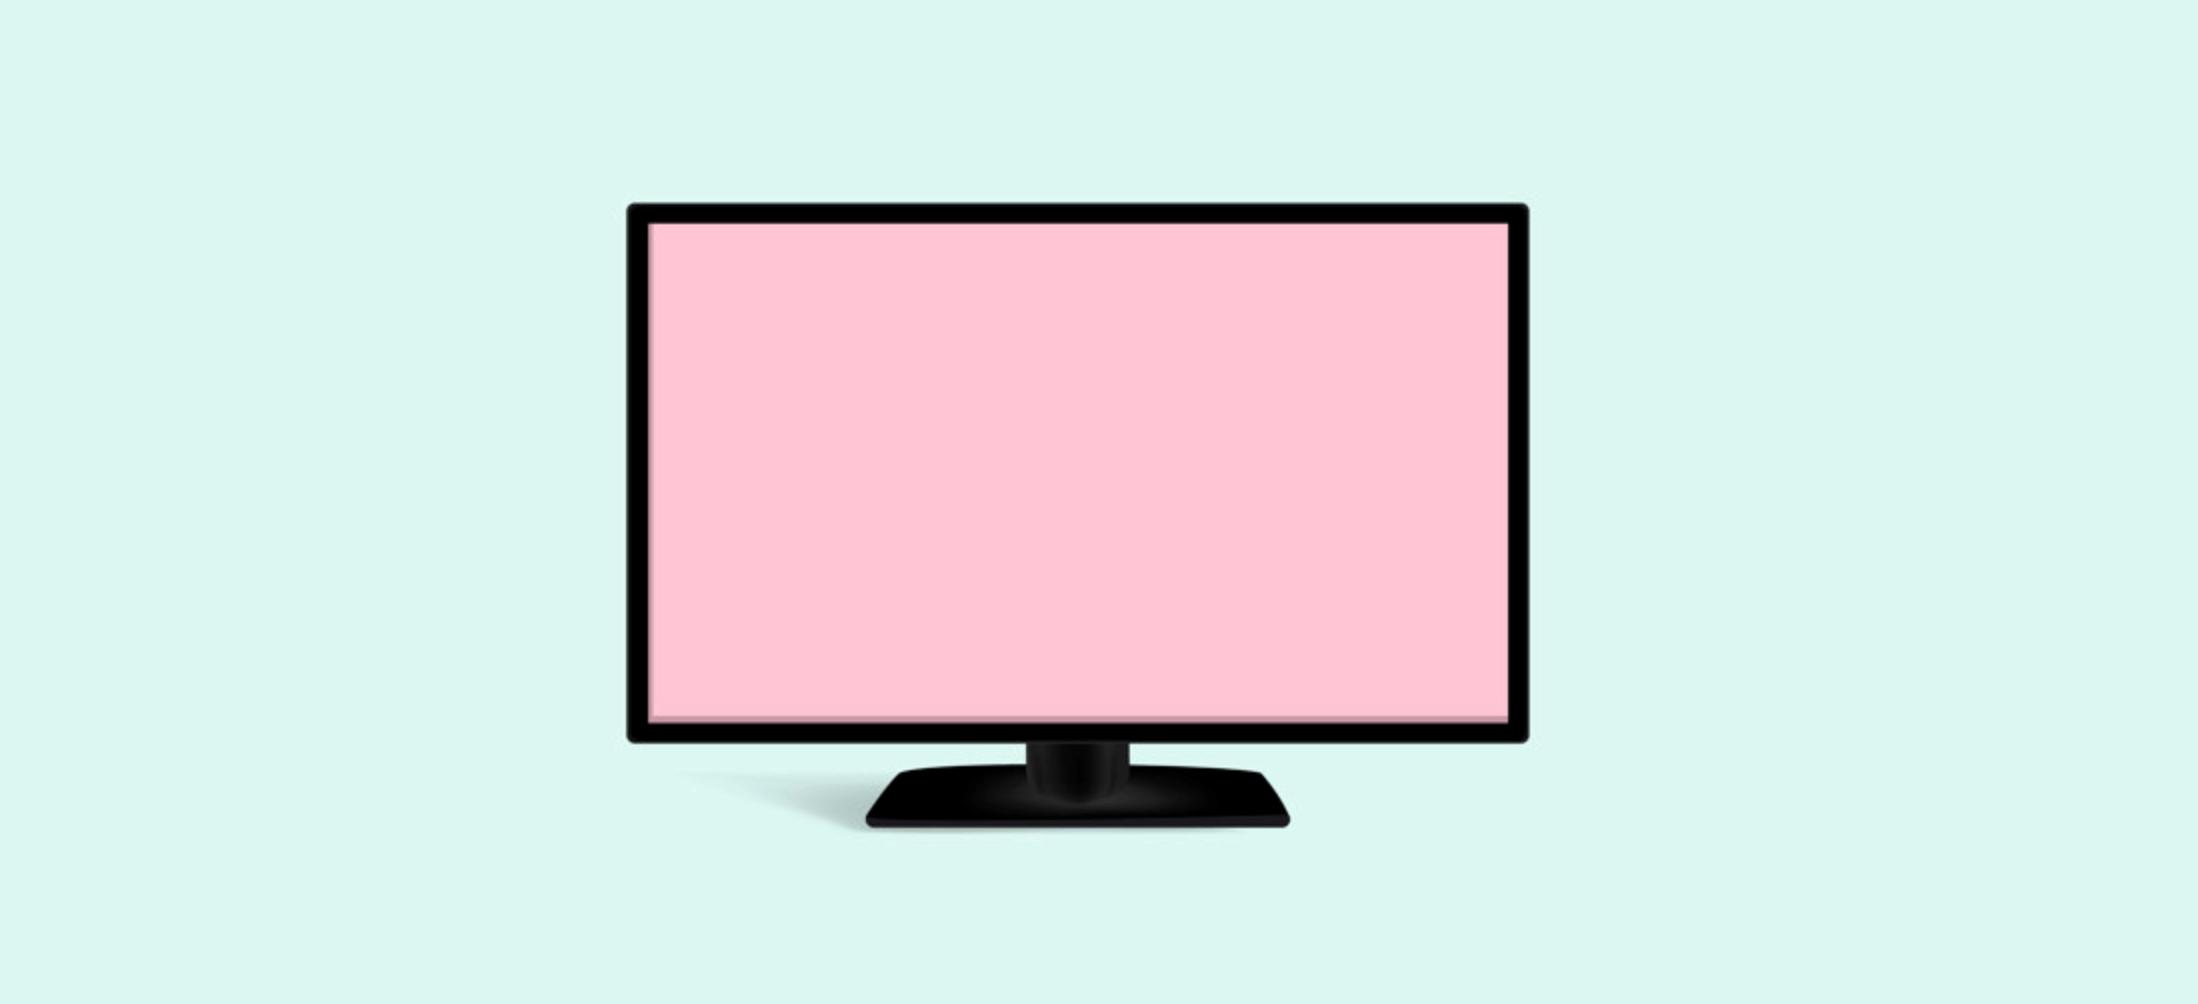 mejor monitor o pantalla para diseño gráfico